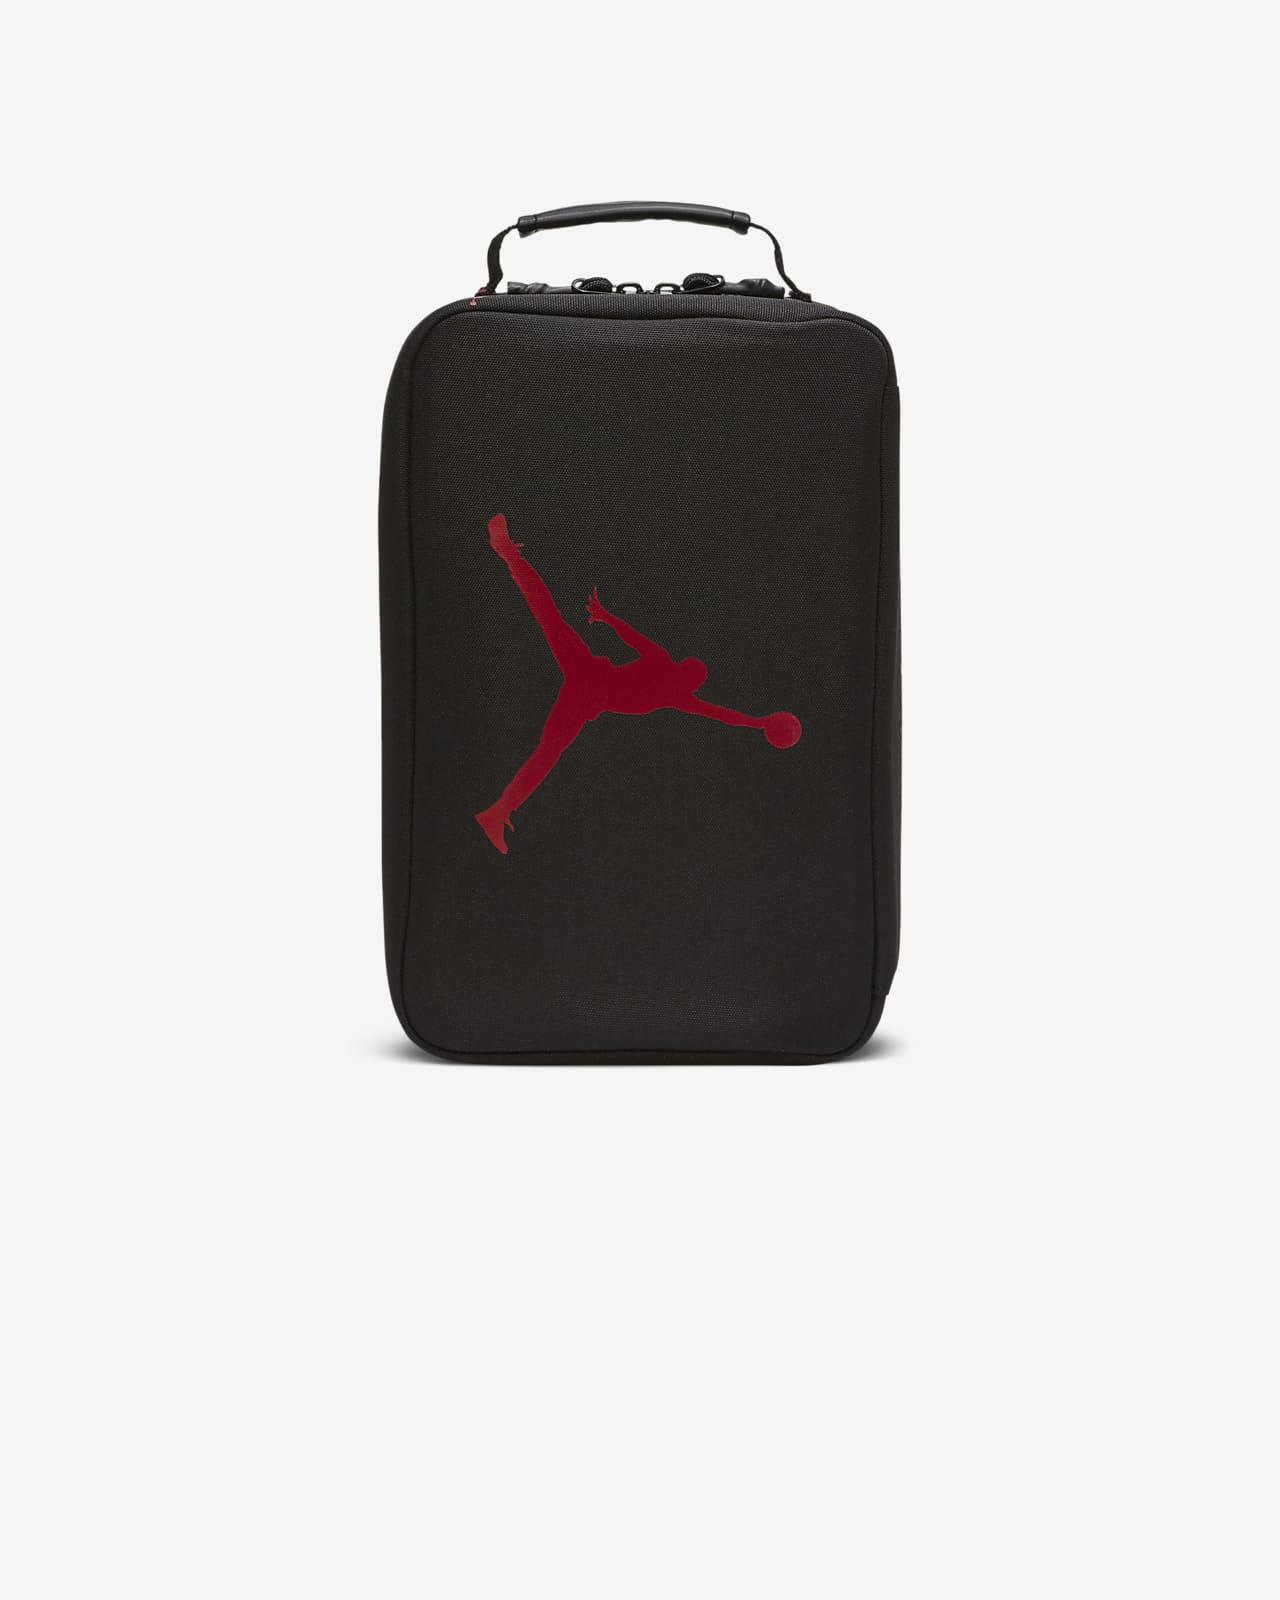 Jordan Shoebox Bag